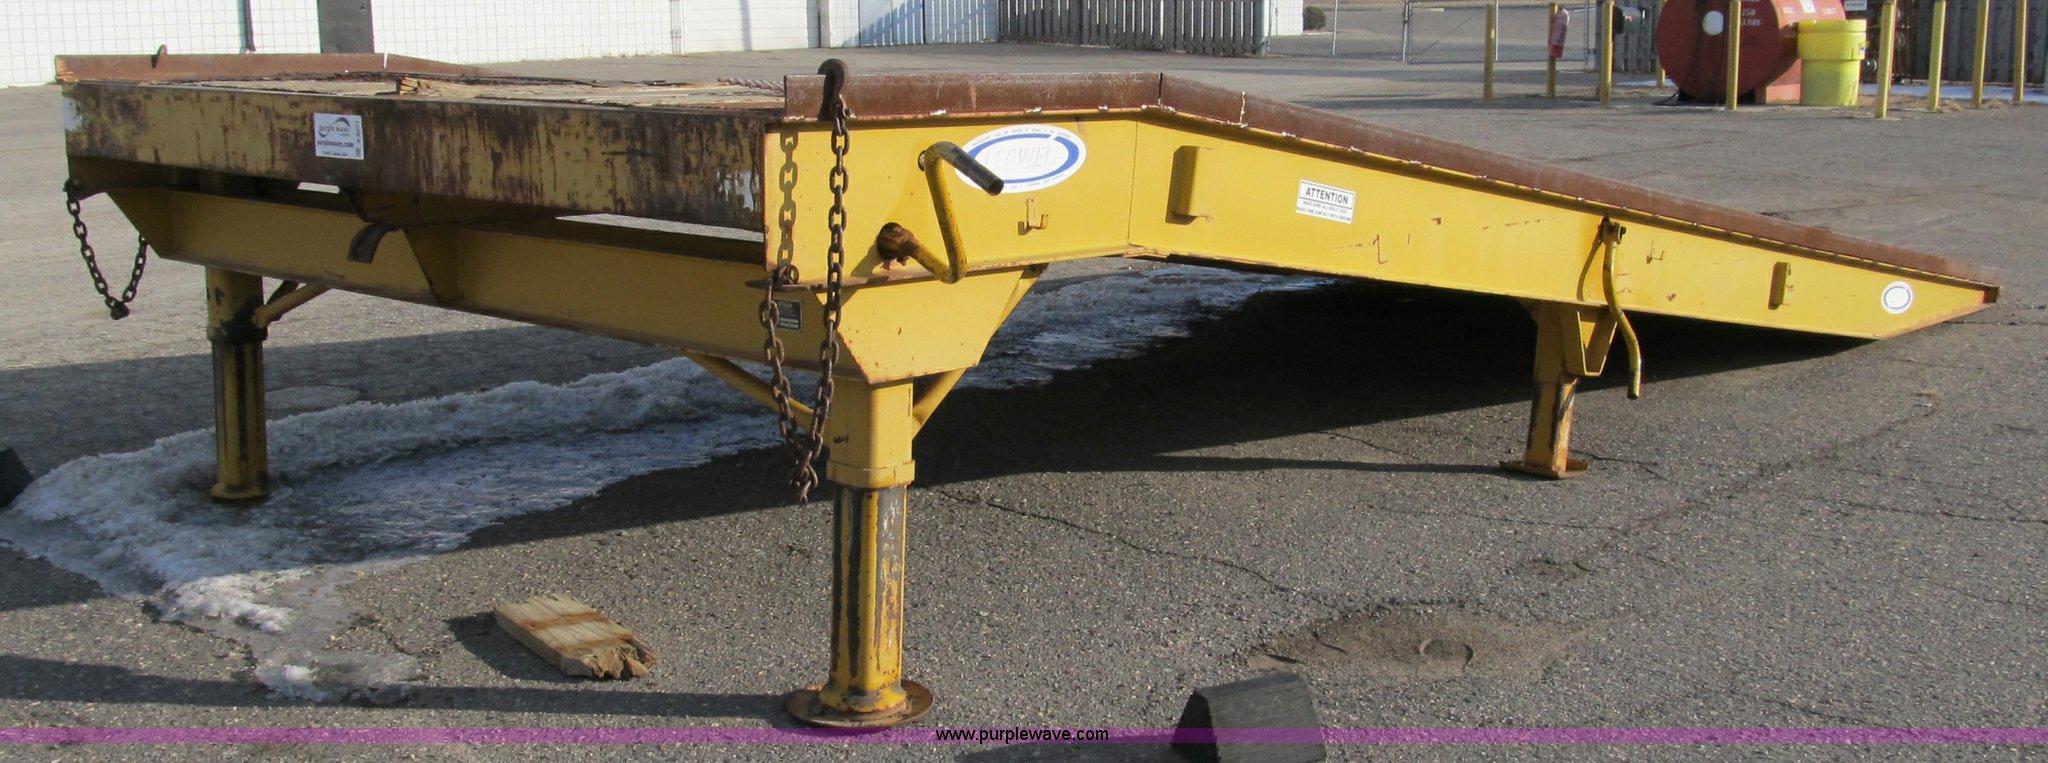 Ledwell 25 Portable Loading Dock Ramp Item A8071 Sold